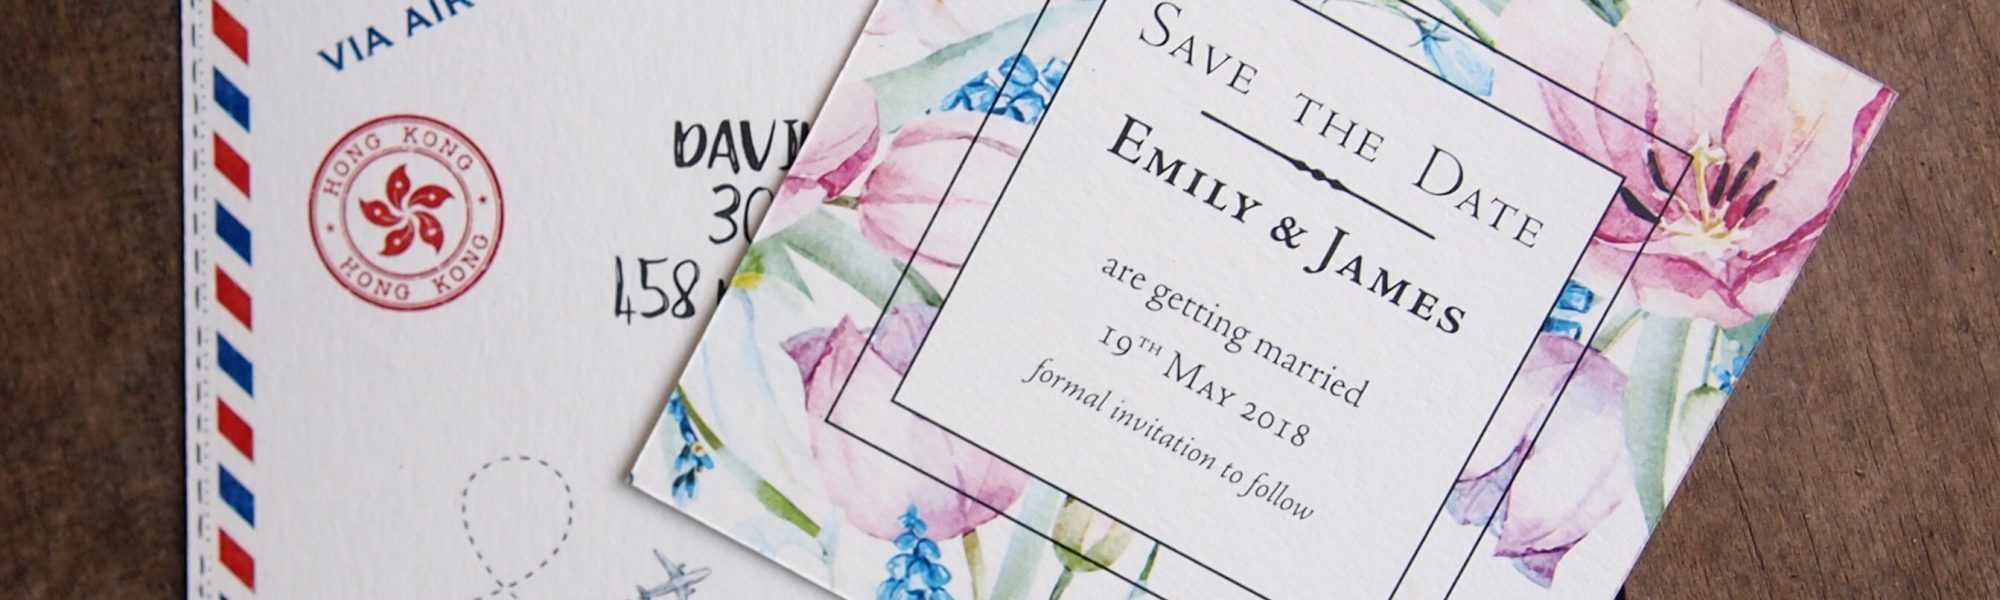 Digitally printed Wedding Stationery. Design by The Smallprint Co.